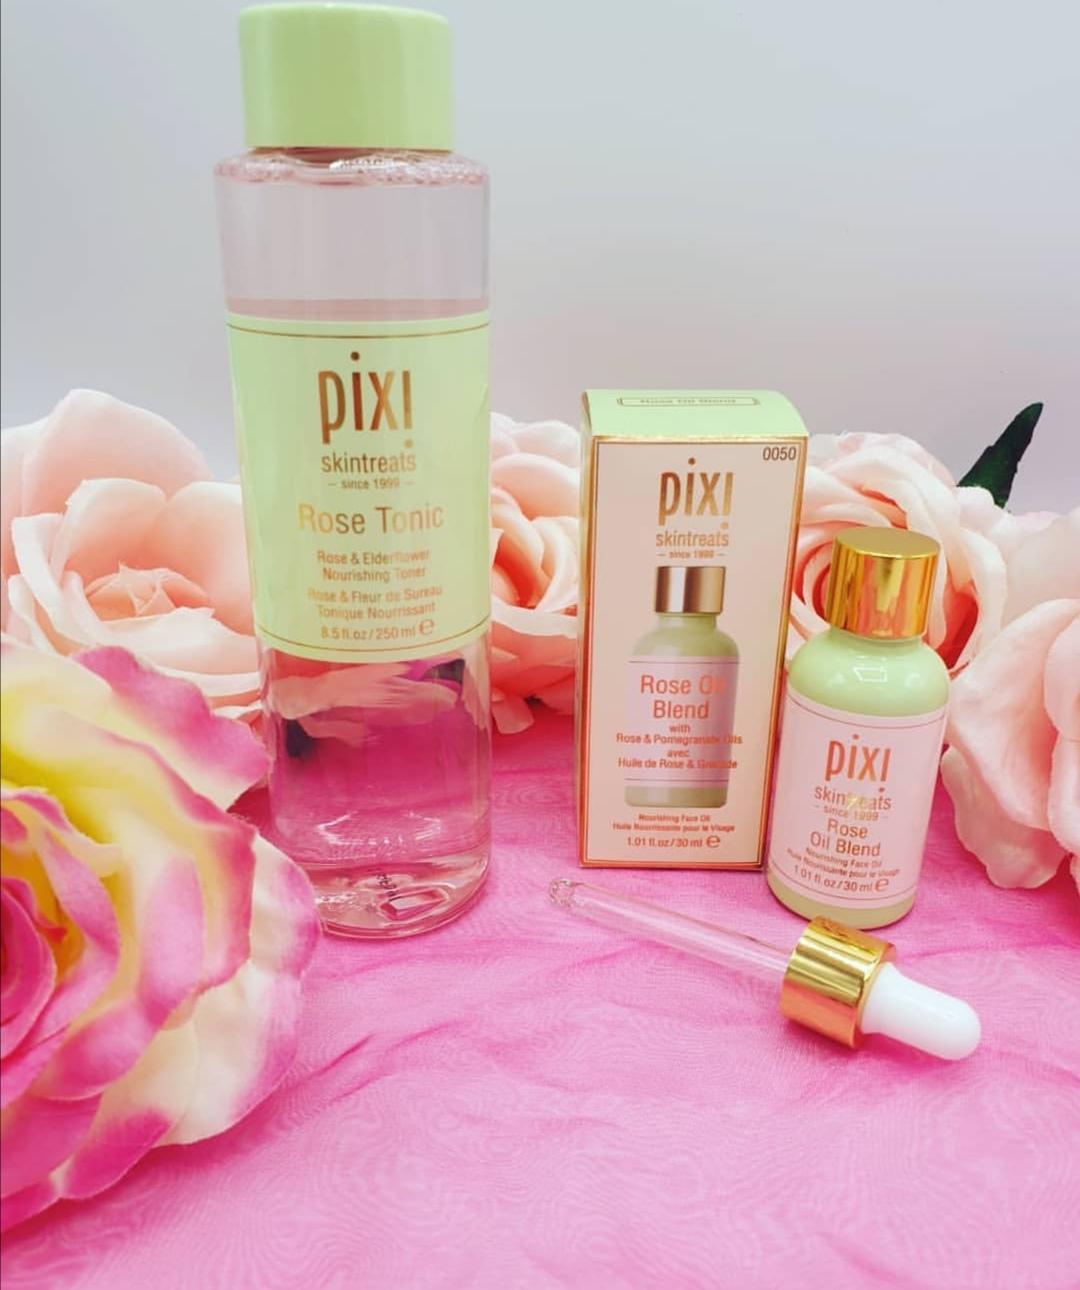 Pixi Rose Tonic & Rose Oil Blend|Review